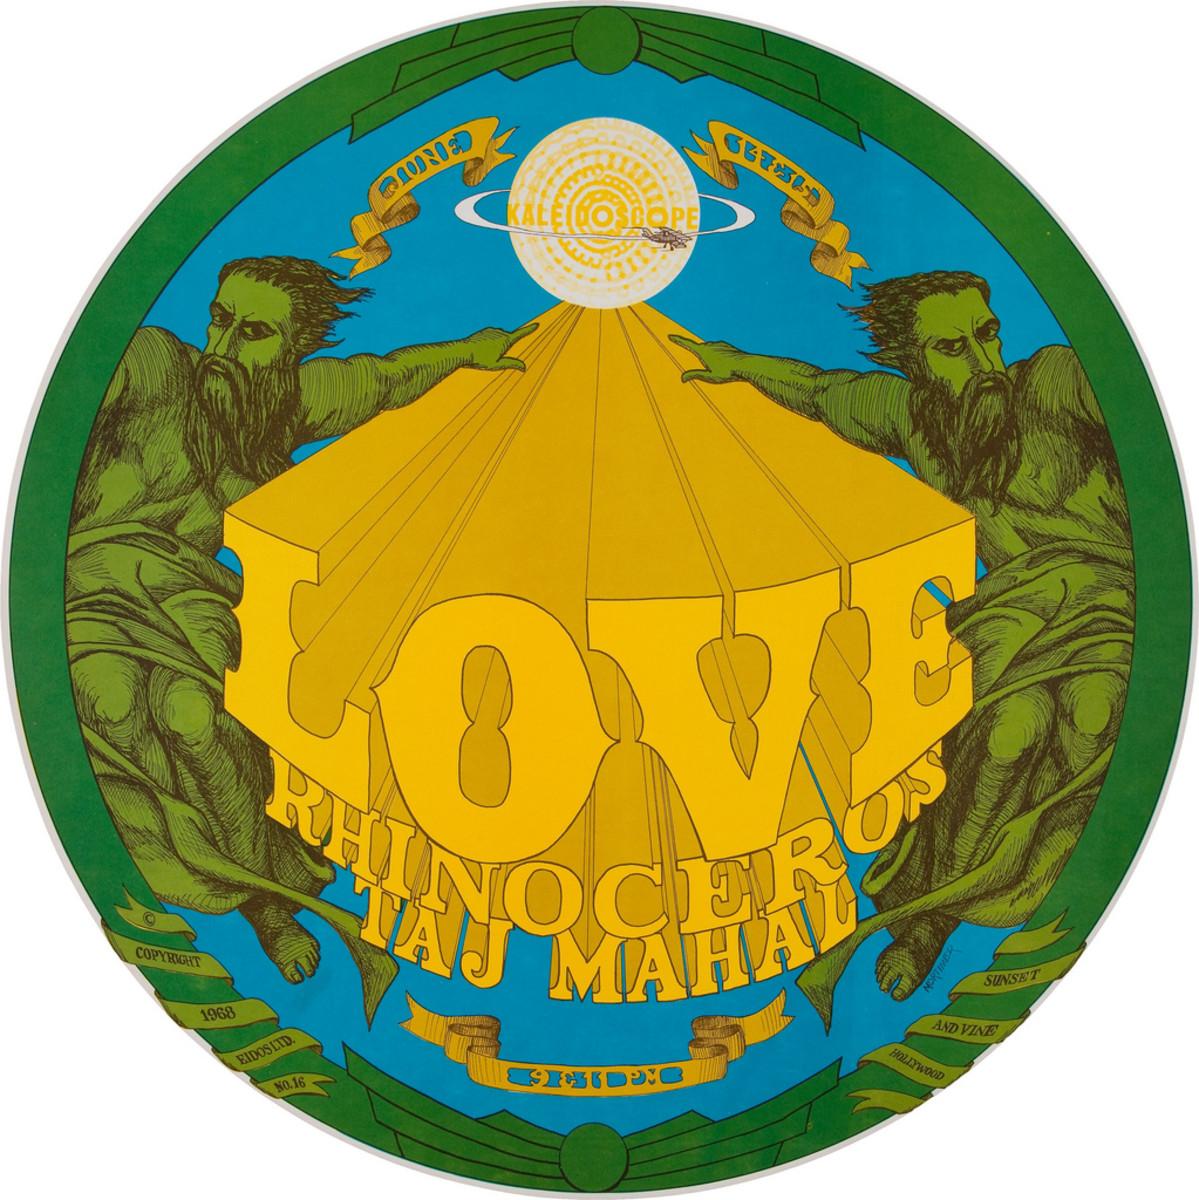 Love, Rhinoceros, Taj Mahal, Kaleidoscope Round Concert Poster (1968) Poster #16 from Series